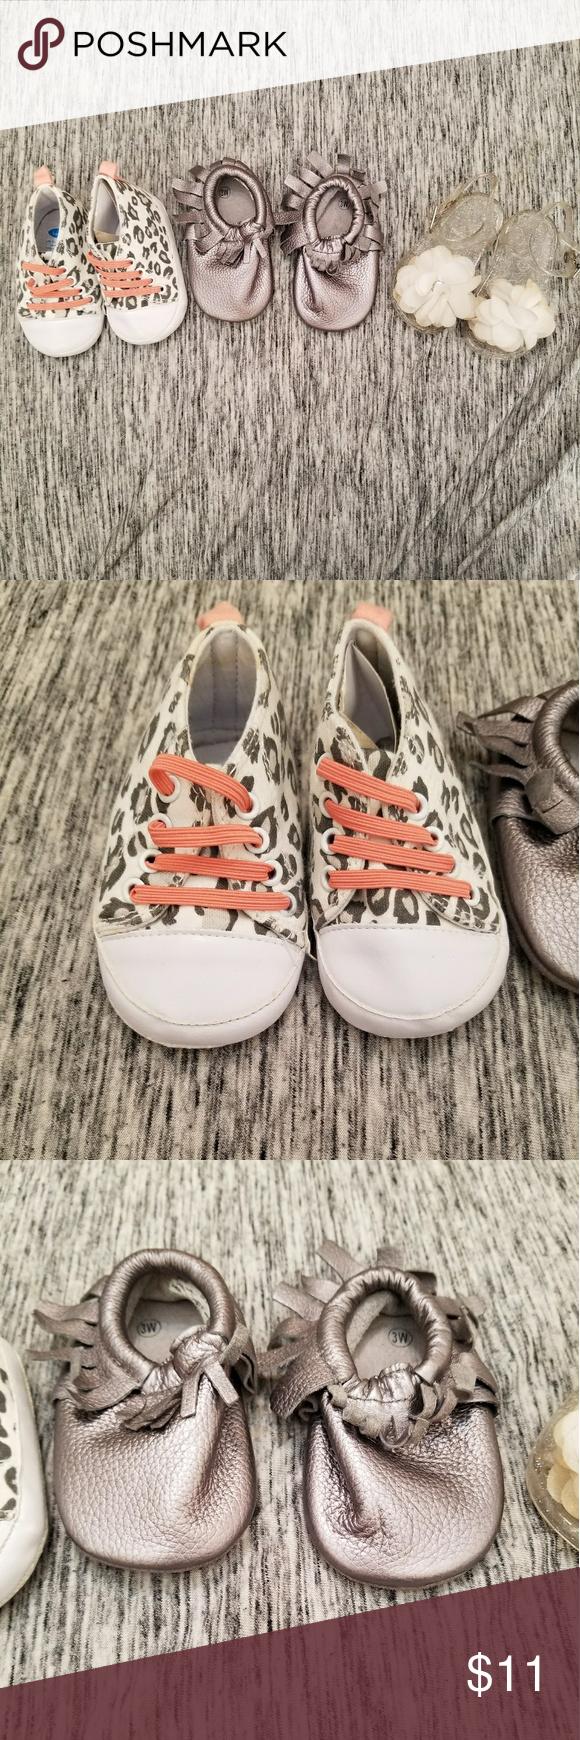 0923653b88 3 Pack Shoe Bundle Babygirl Size 3 Bon Bebe Shoes Slippers | My Posh ...